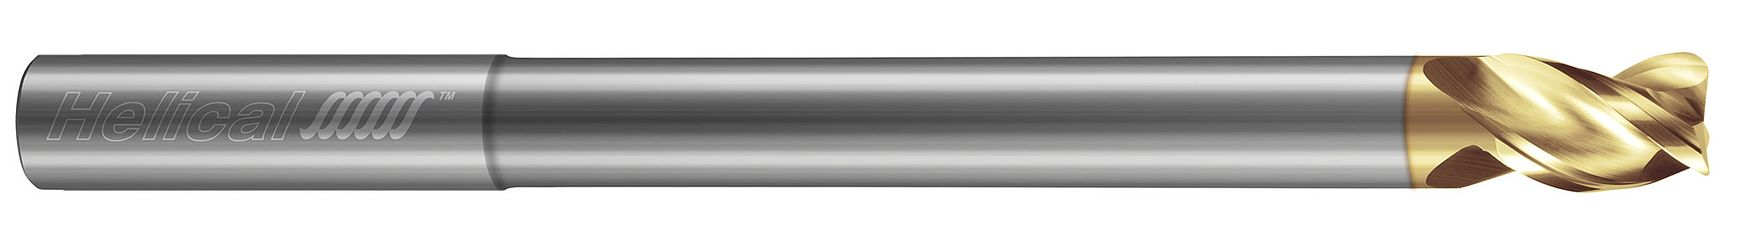 tool-details-46416